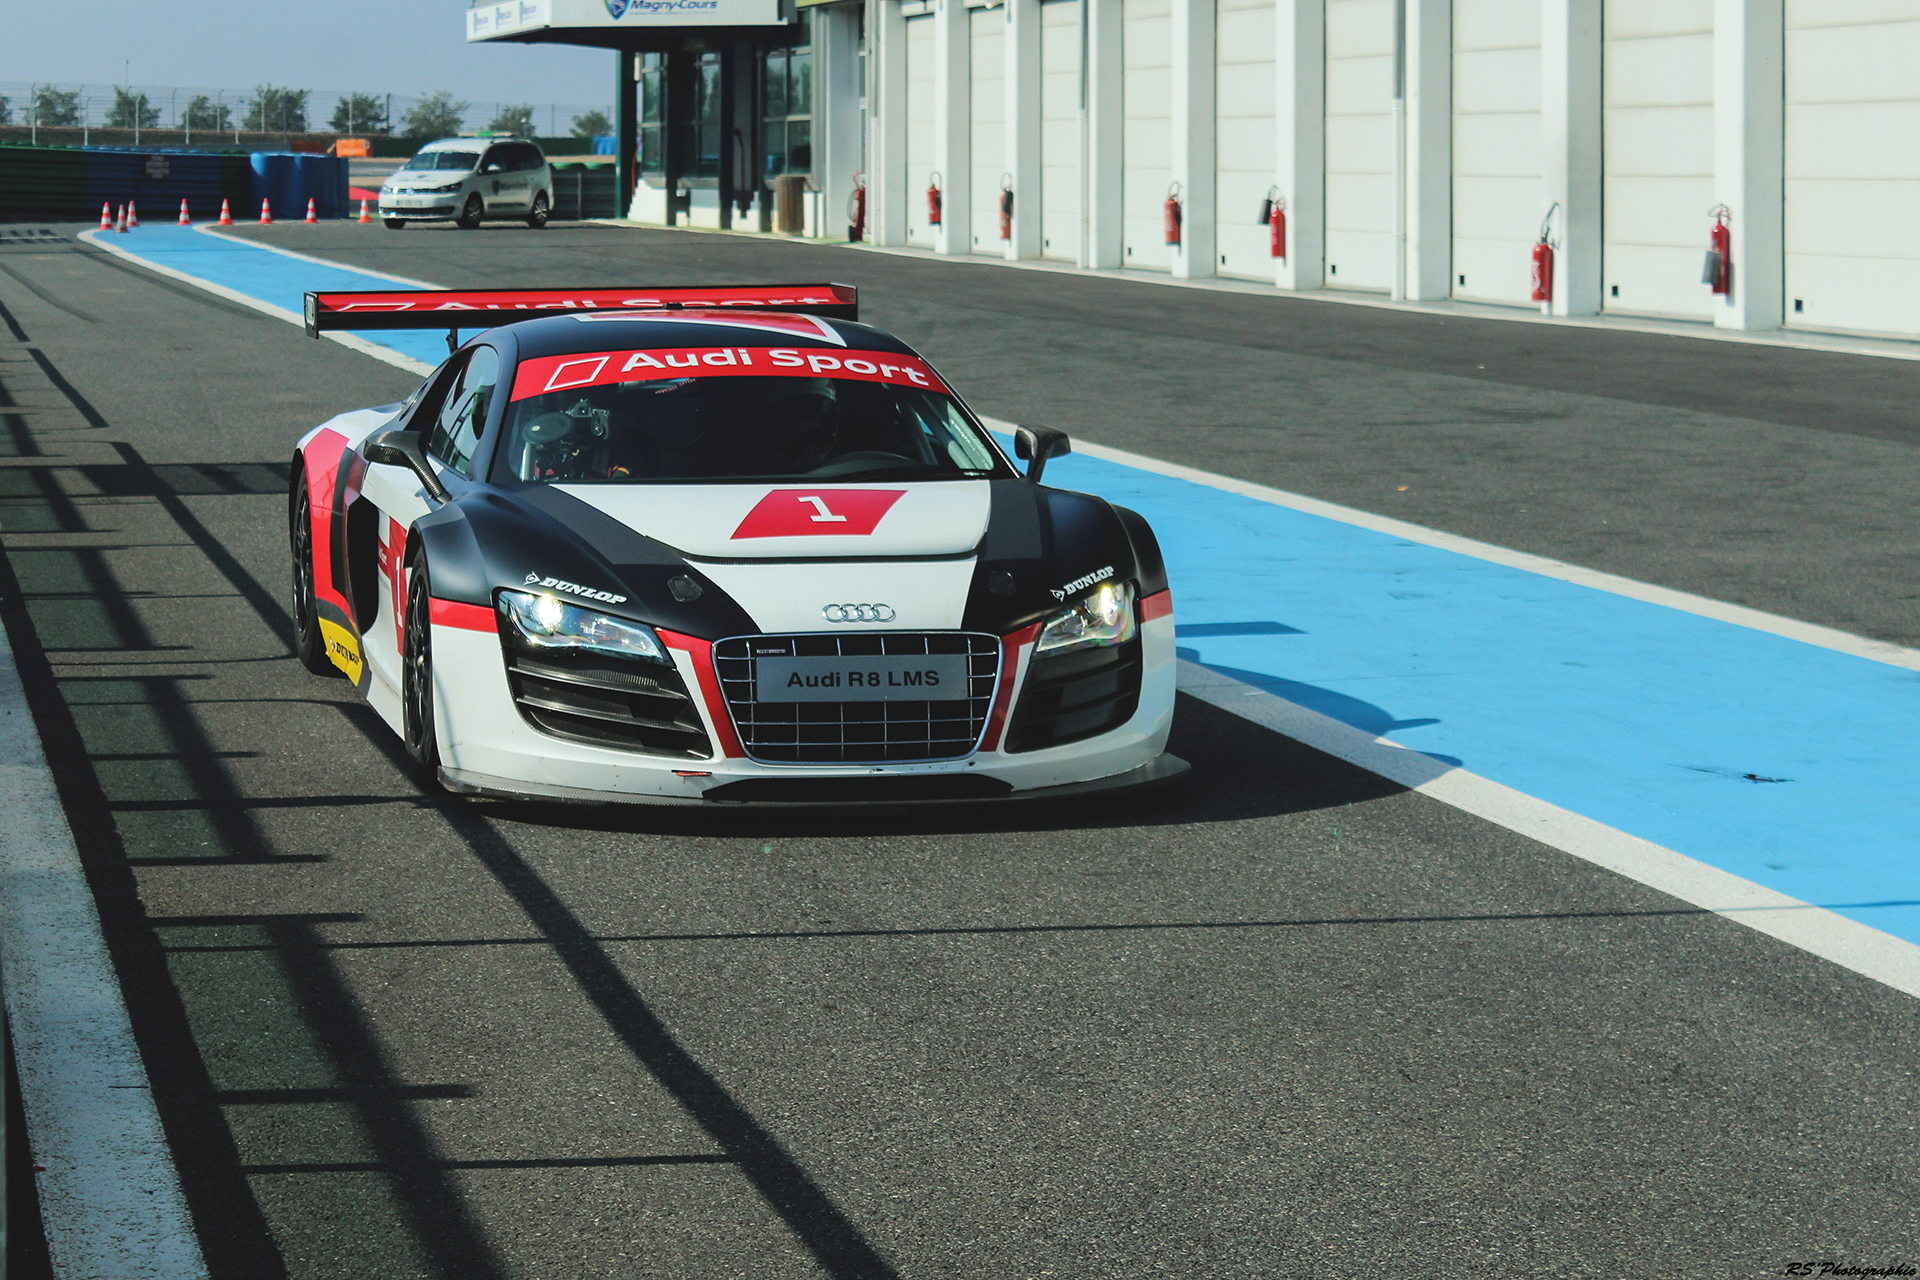 Audi R8 LMS GT3 - avant / front - photo Arnaud Demasier